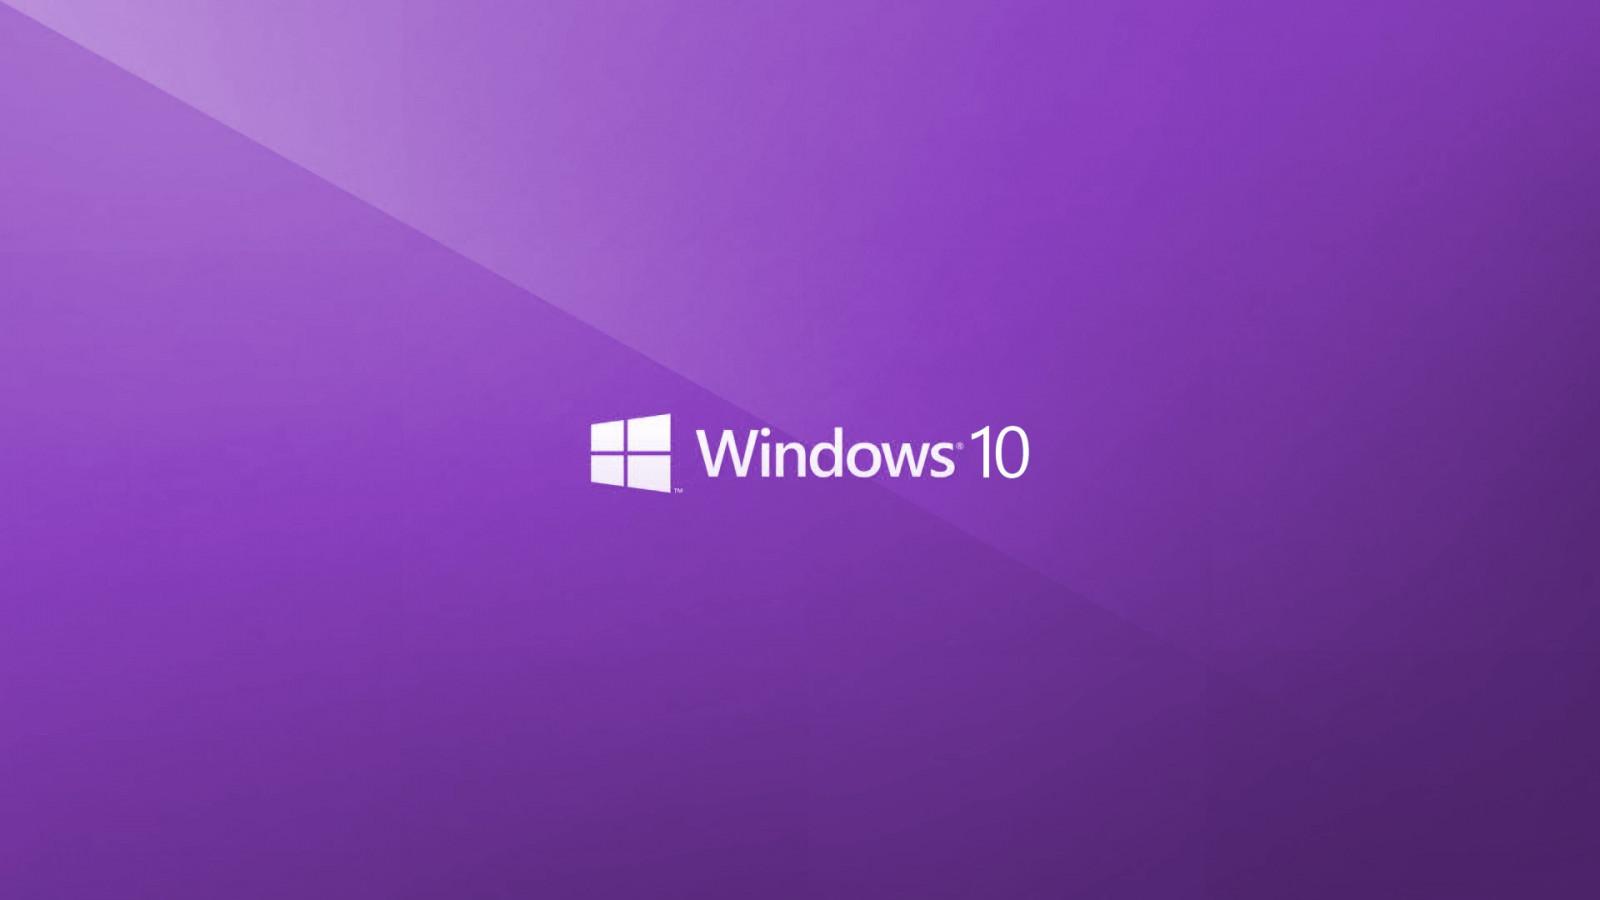 Top 20 Windows 10 Wallpaper Free Download  iSkysoft